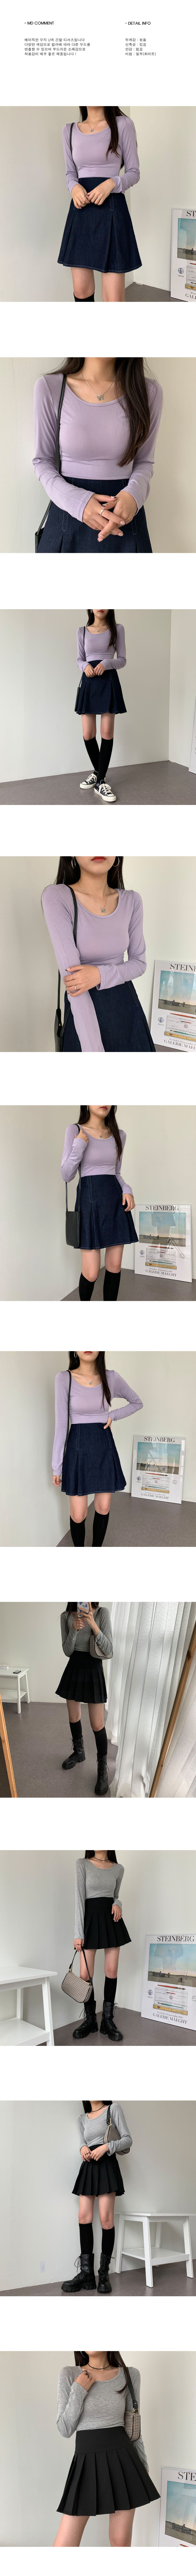 You-neck Span Basic Long Sleeve T-shirt